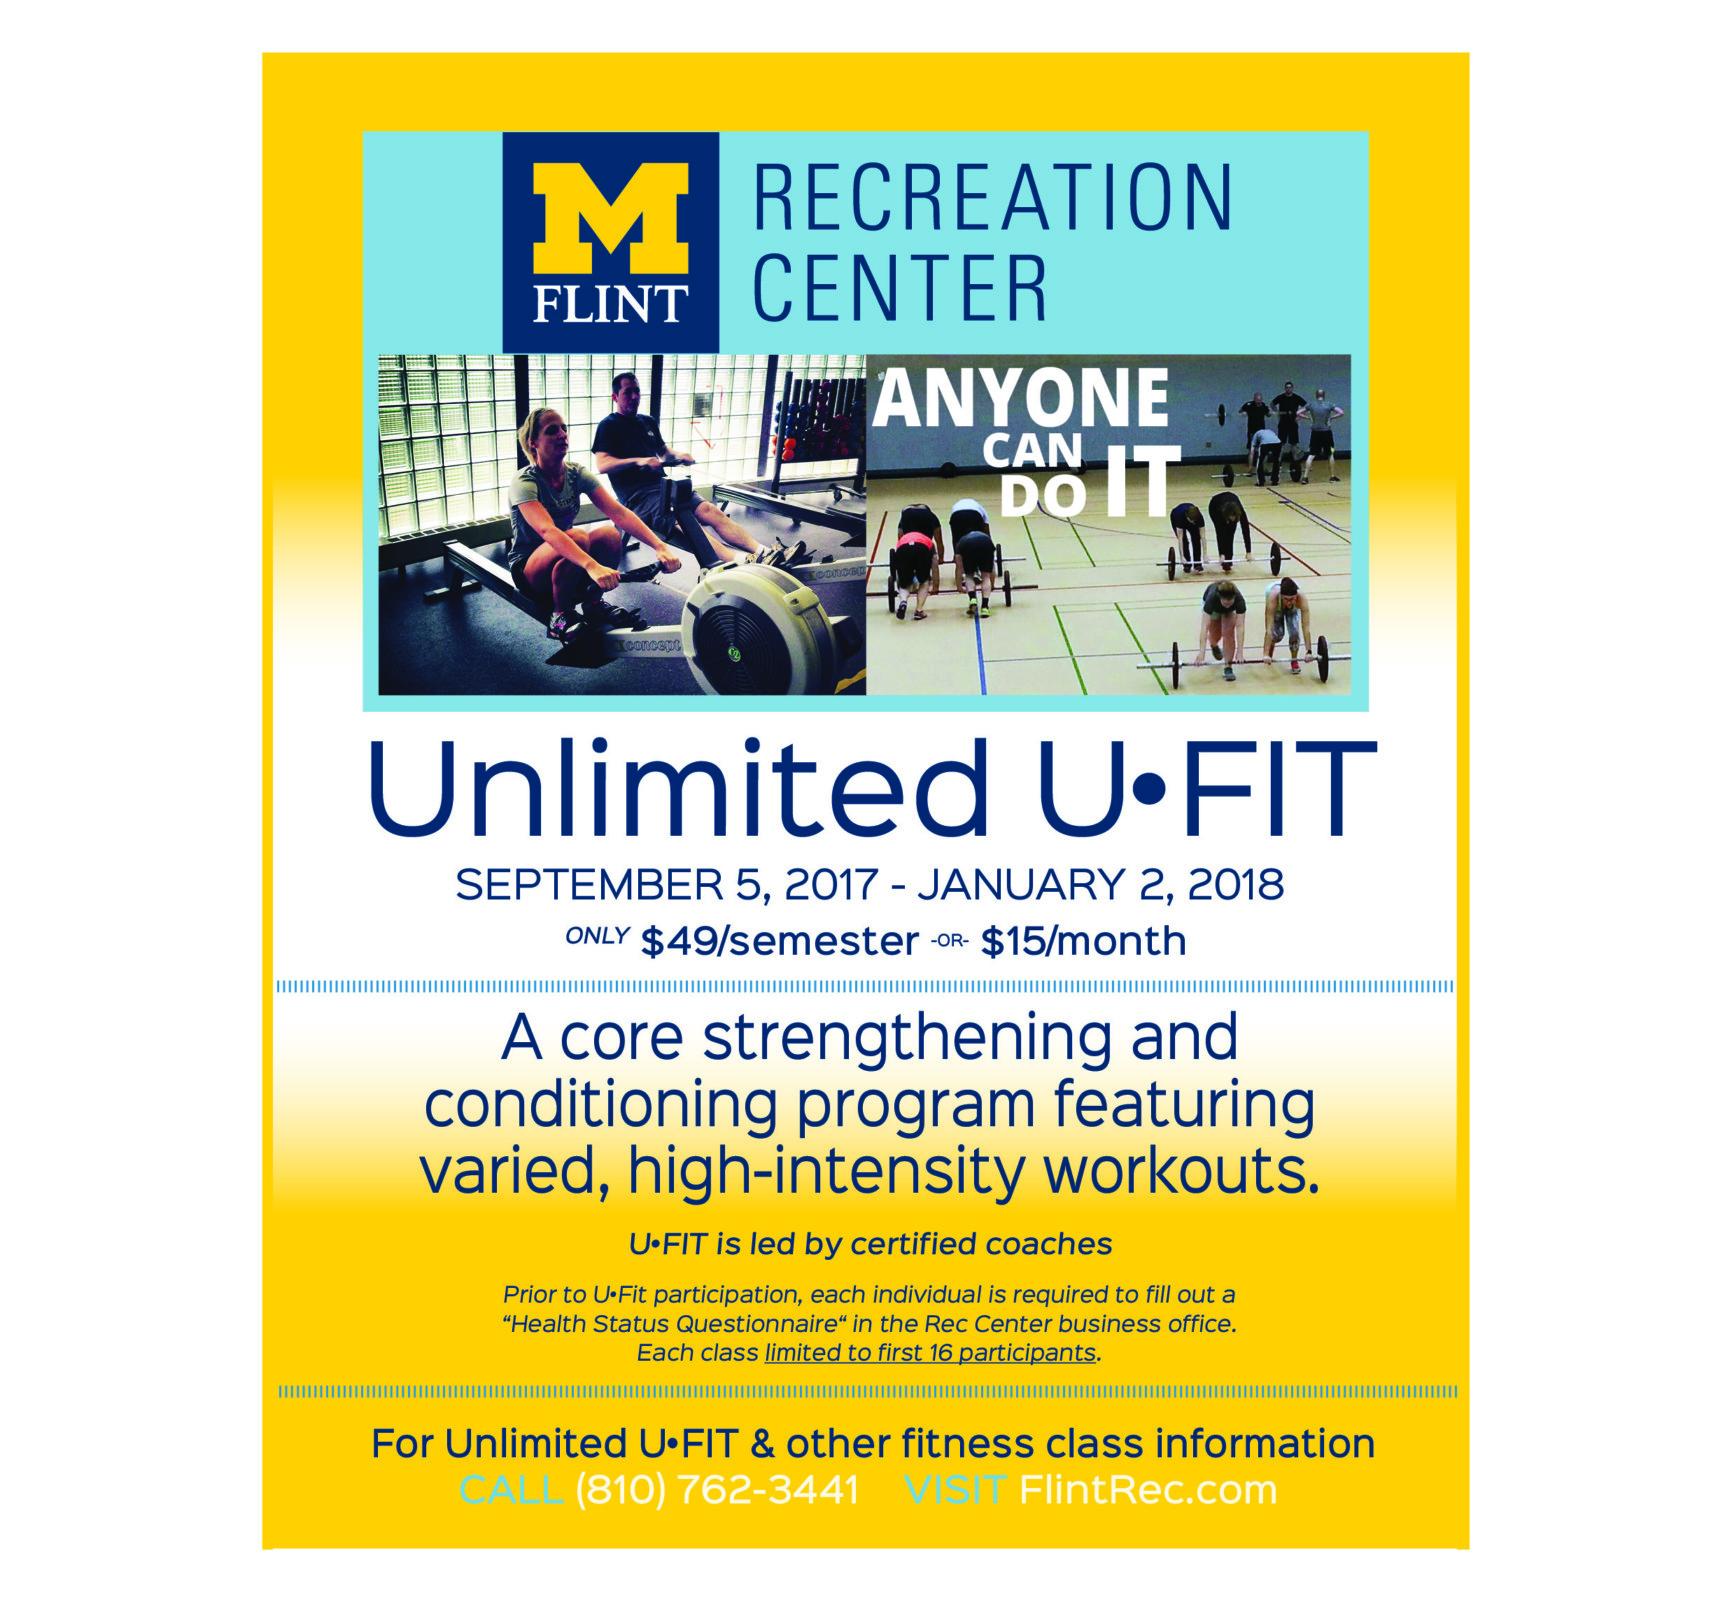 Unlimited UFIT cross-training program